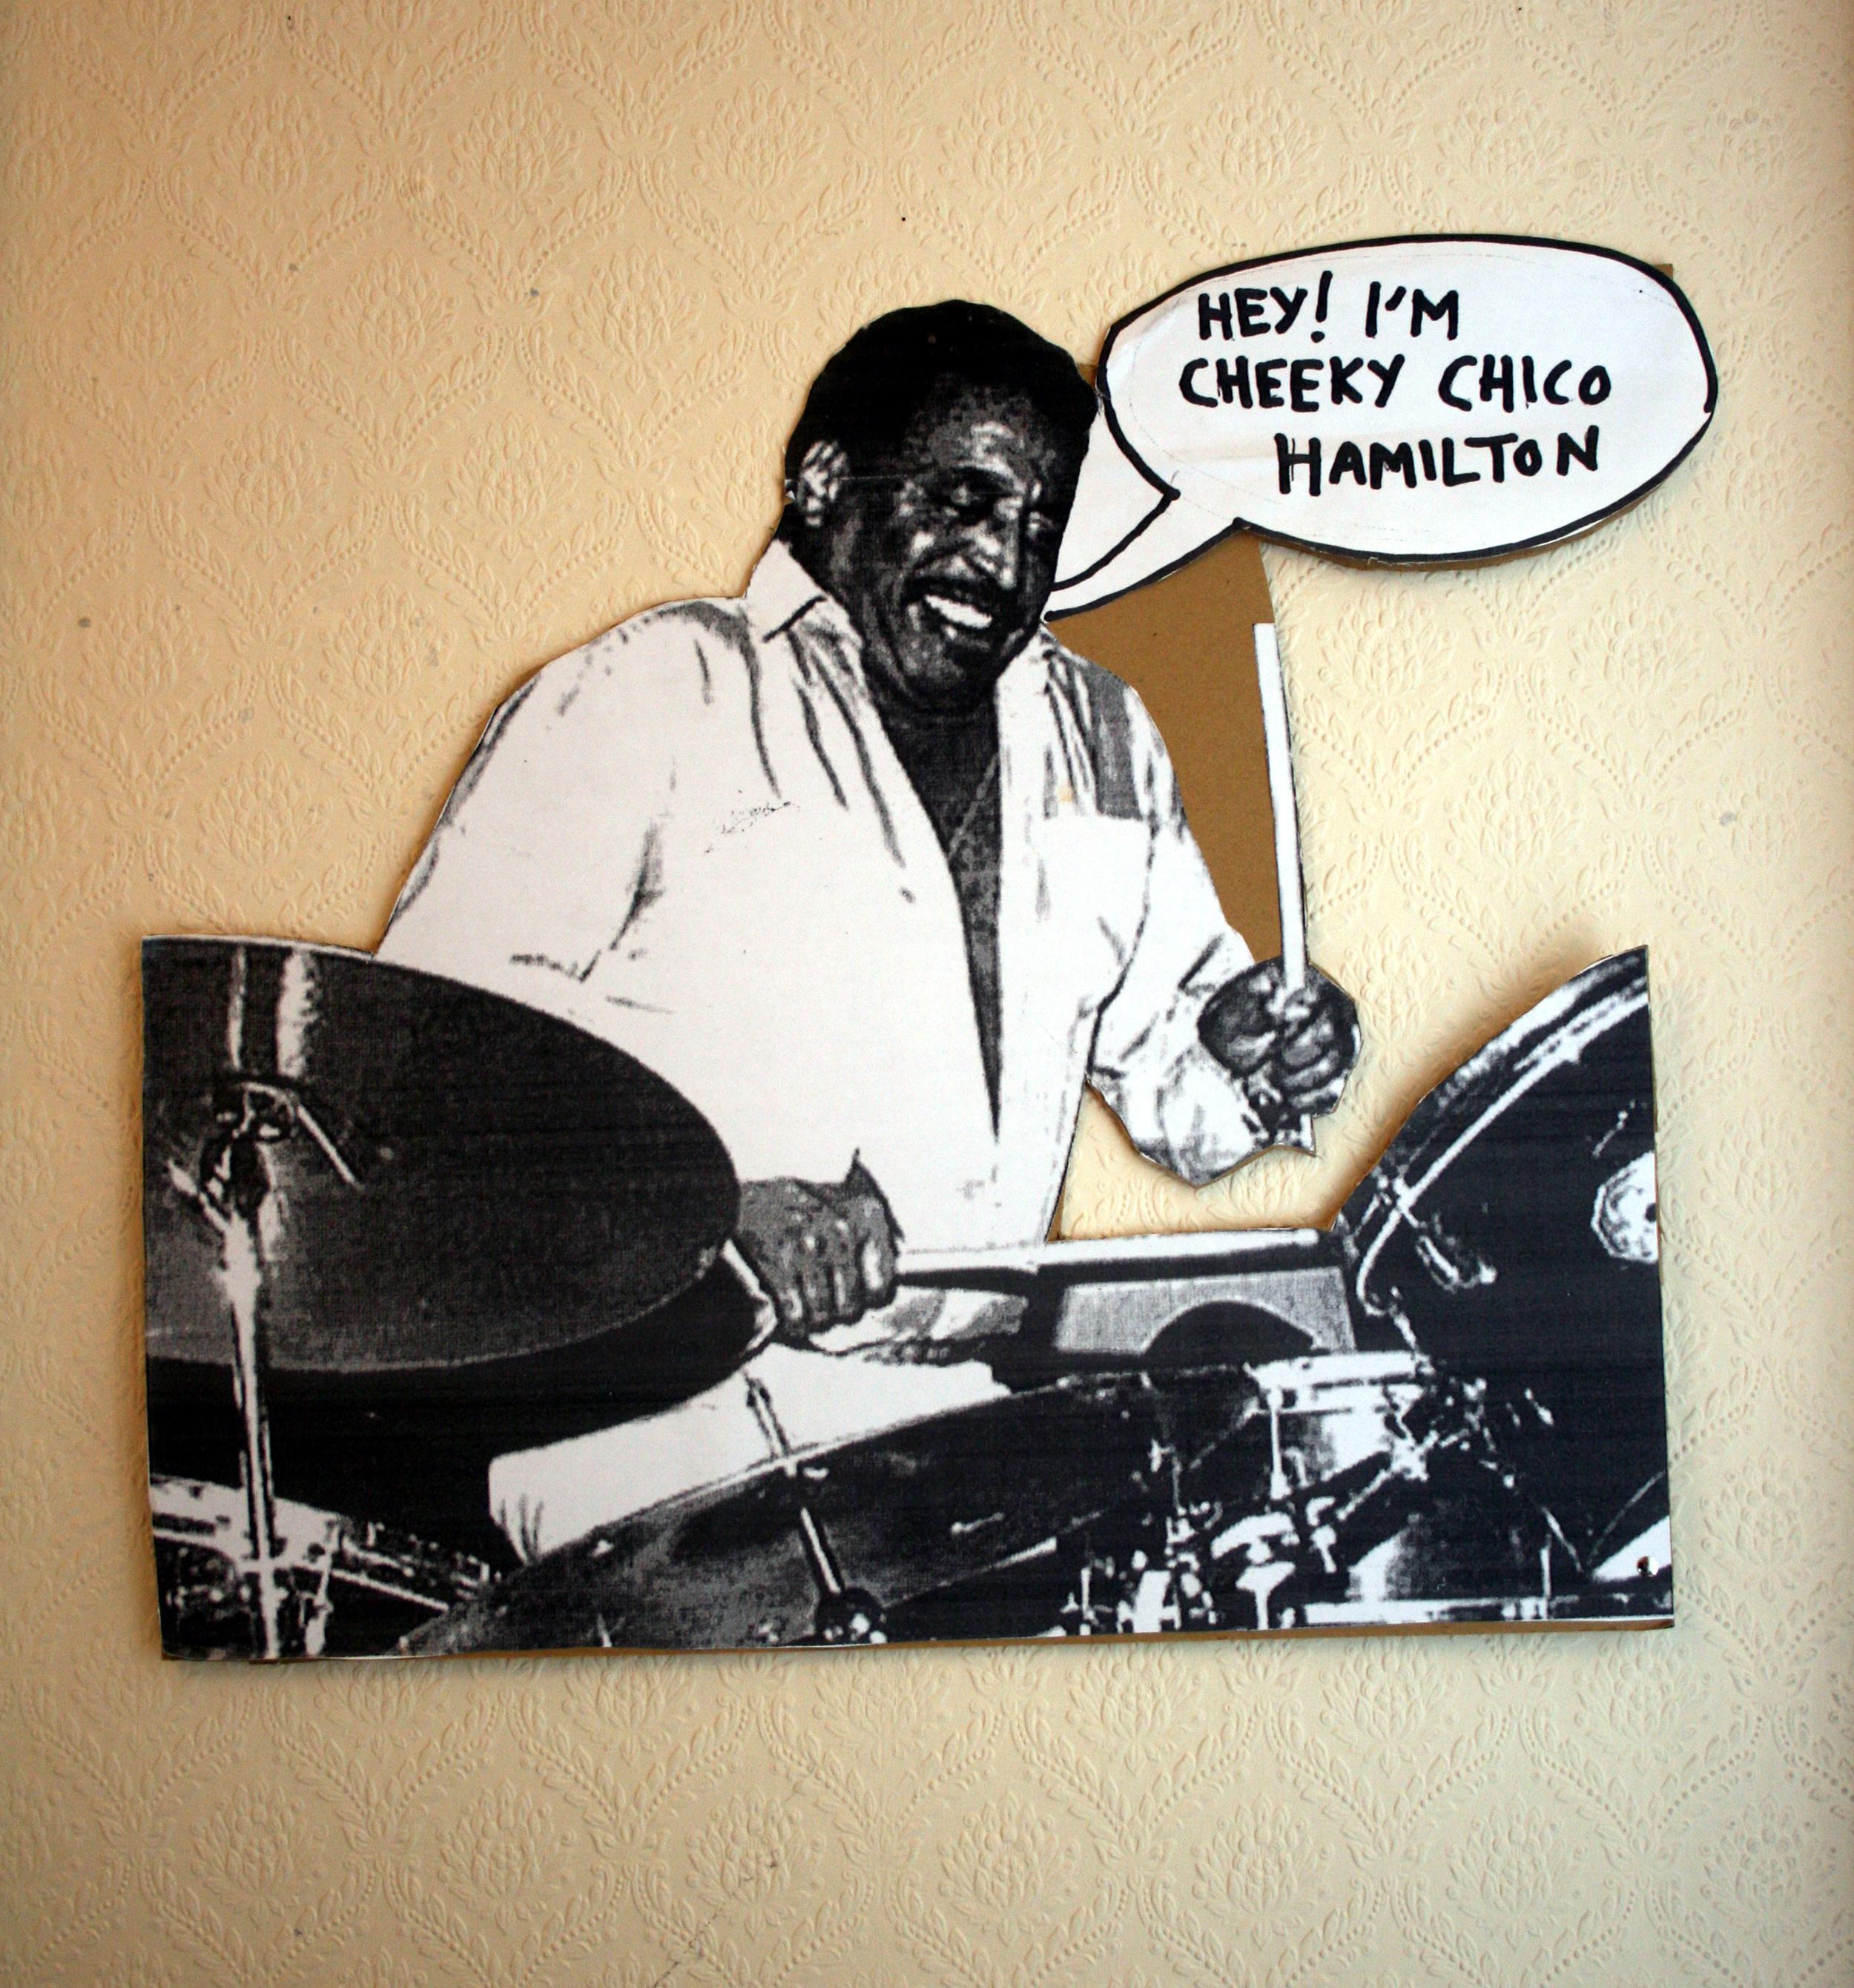 Randan Discotheque & The Cardboard Cut-out Band (Chico Hamilton)